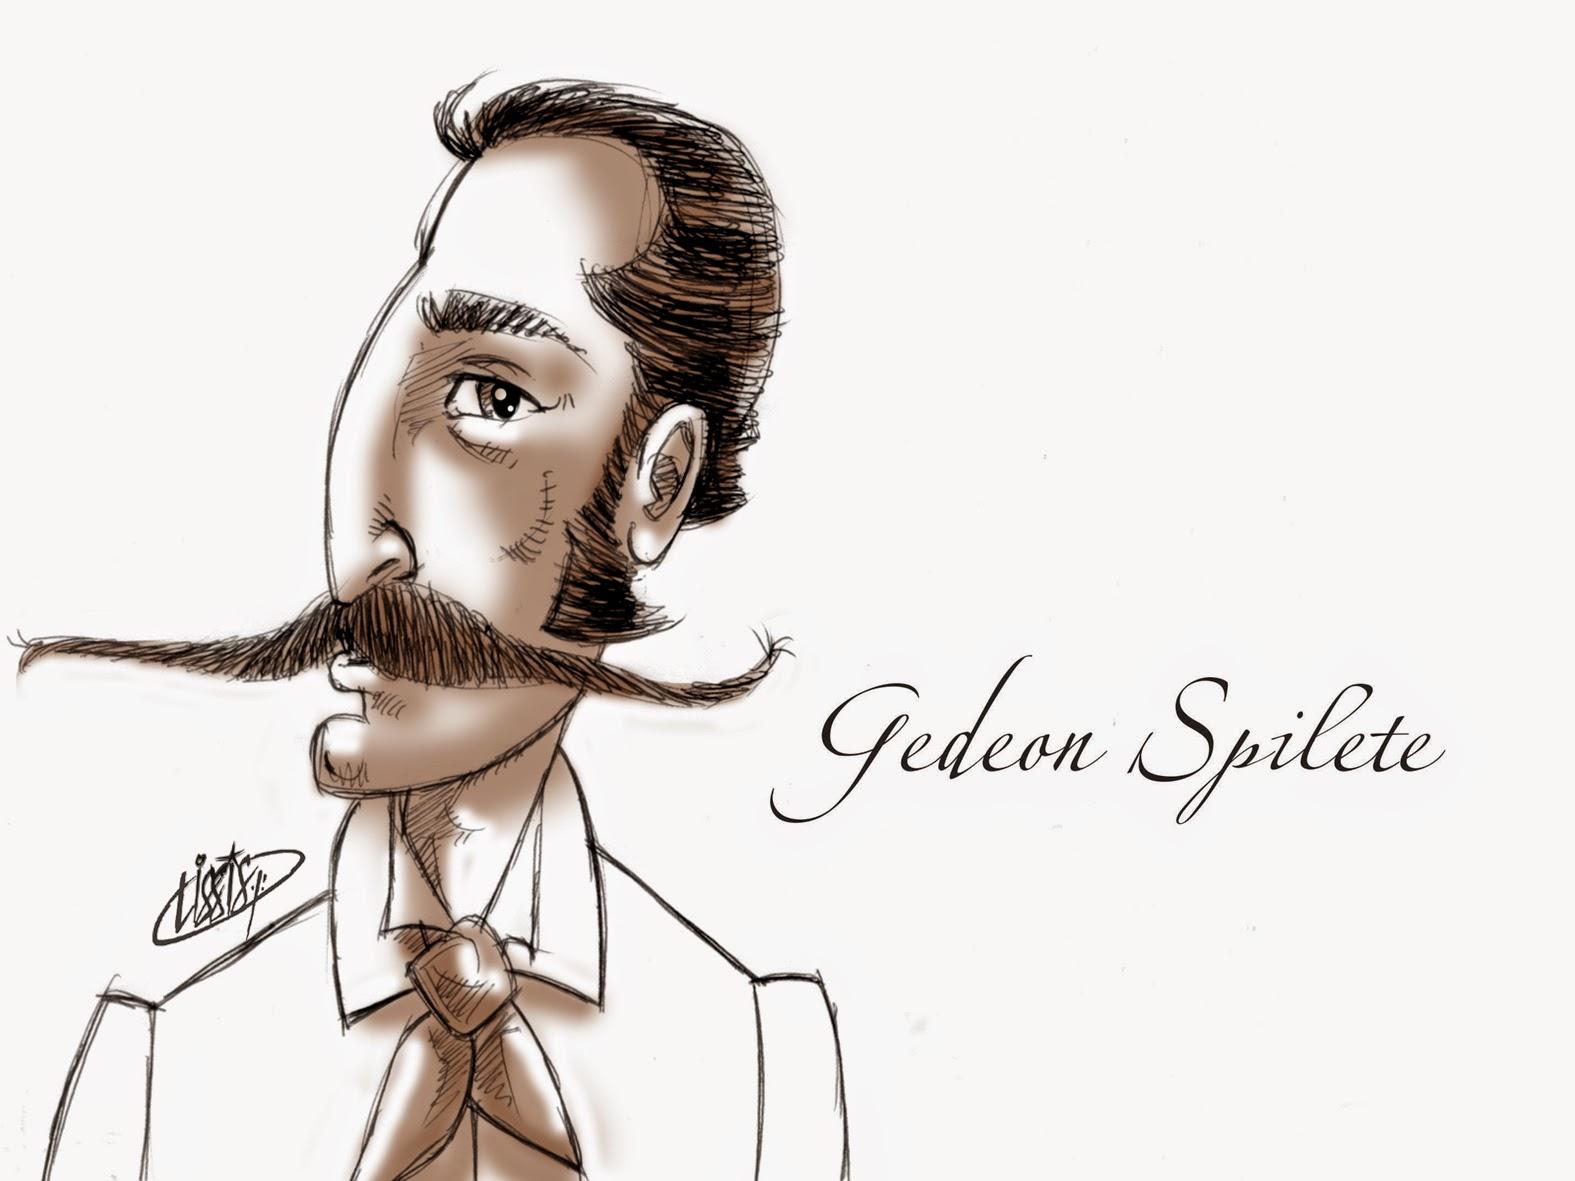 Gedeon Spilete